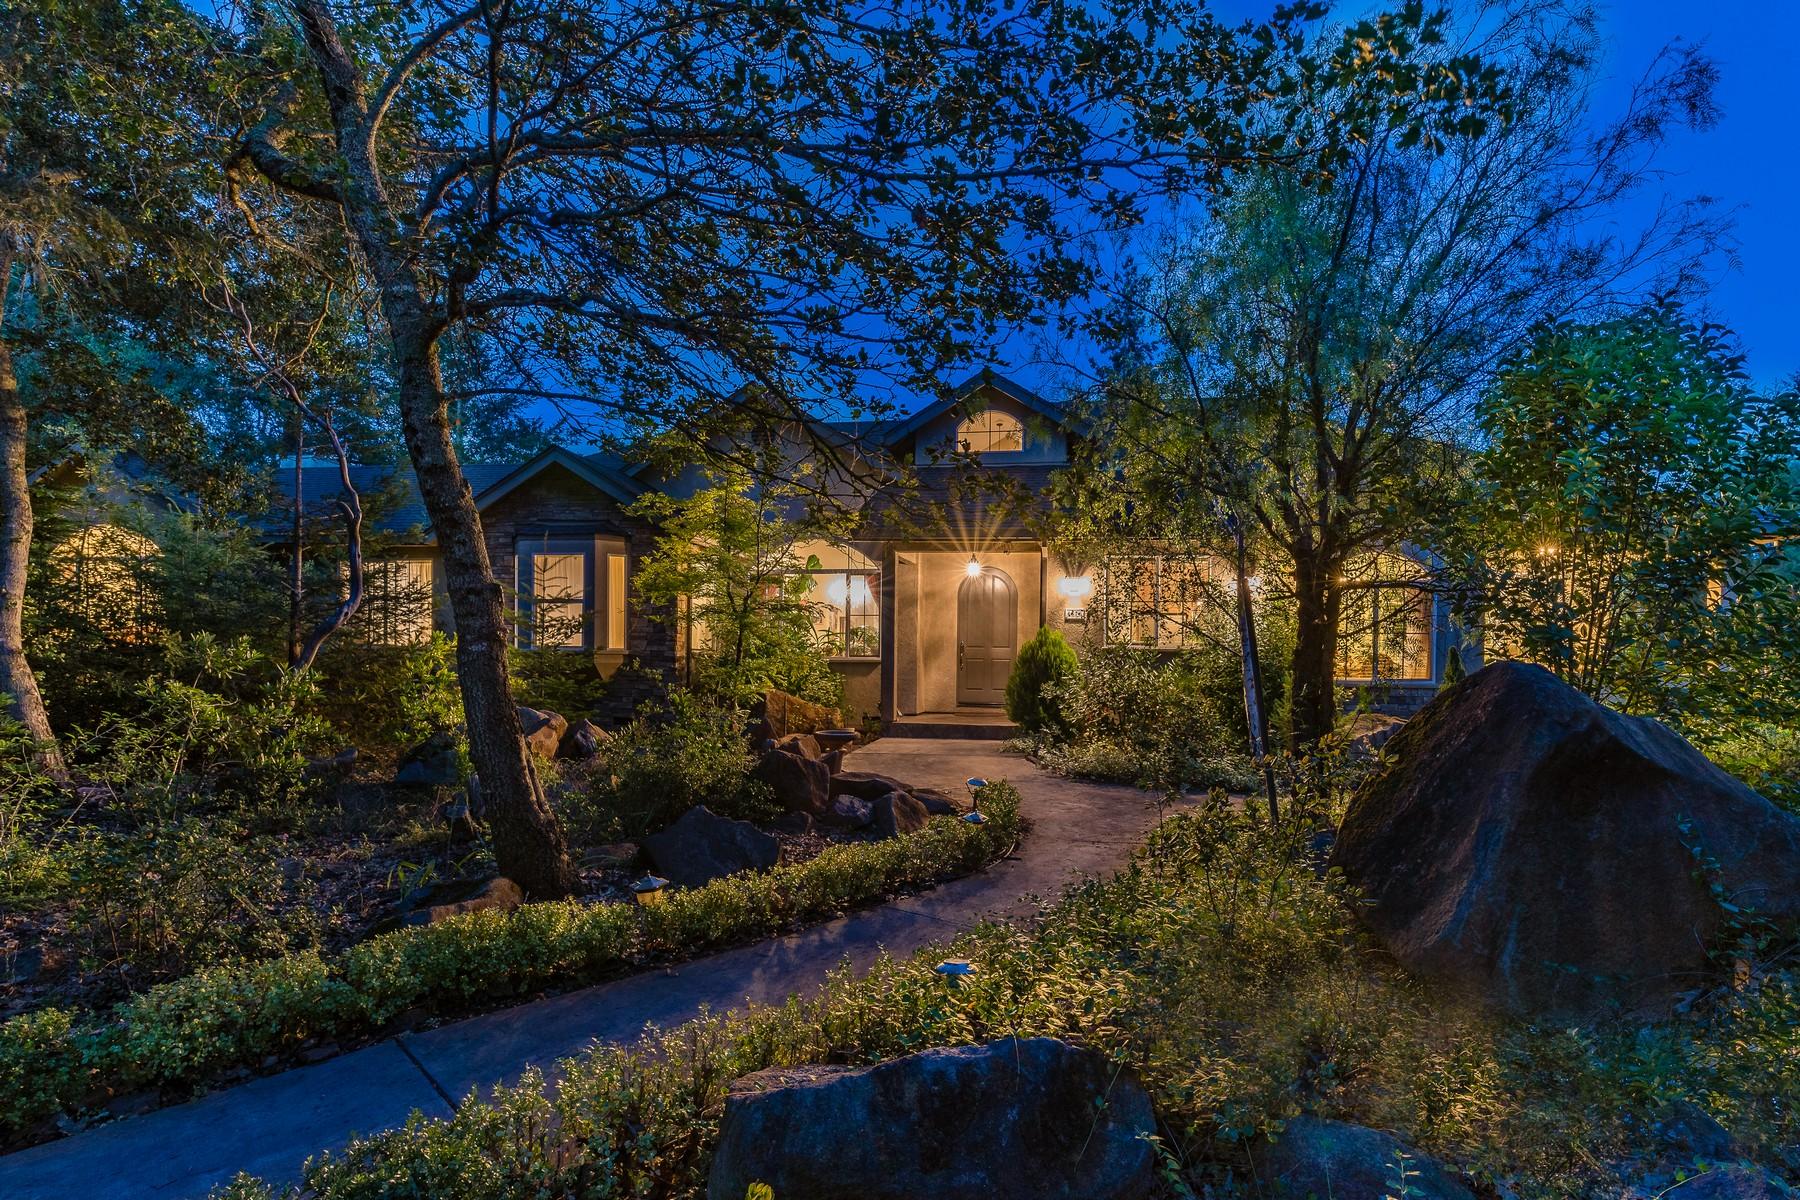 Single Family Homes for Sale at Exquisite Santa Rosa Single Level 1578 Manzanita Avenue Santa Rosa, California 95404 United States